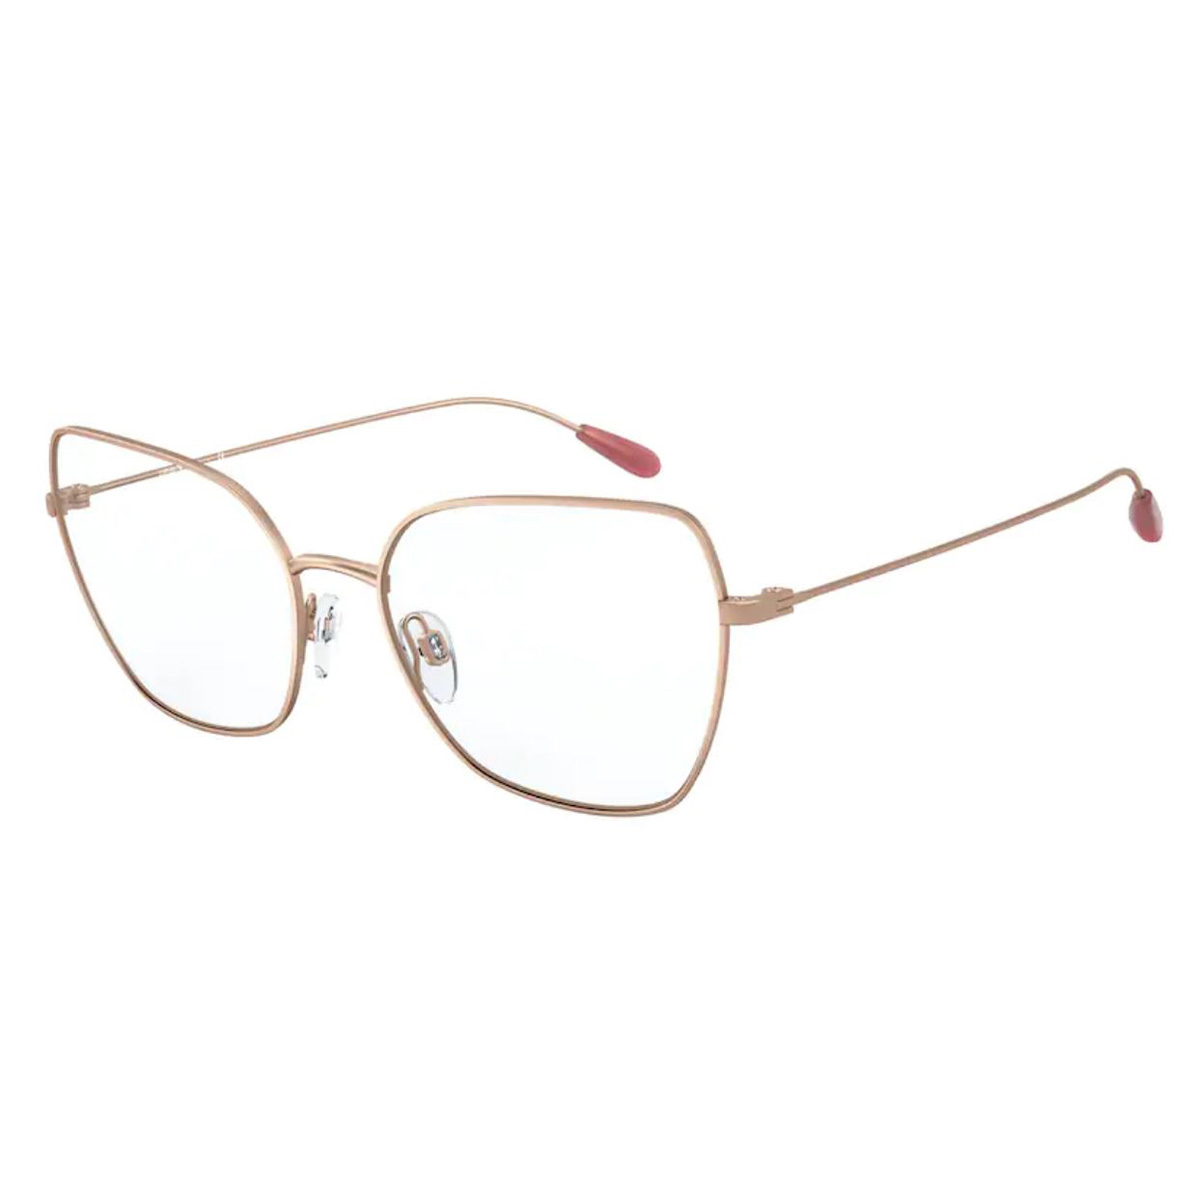 Óculos de Grau Feminino Empório Armani EA1111 Dourado Rose Fosco